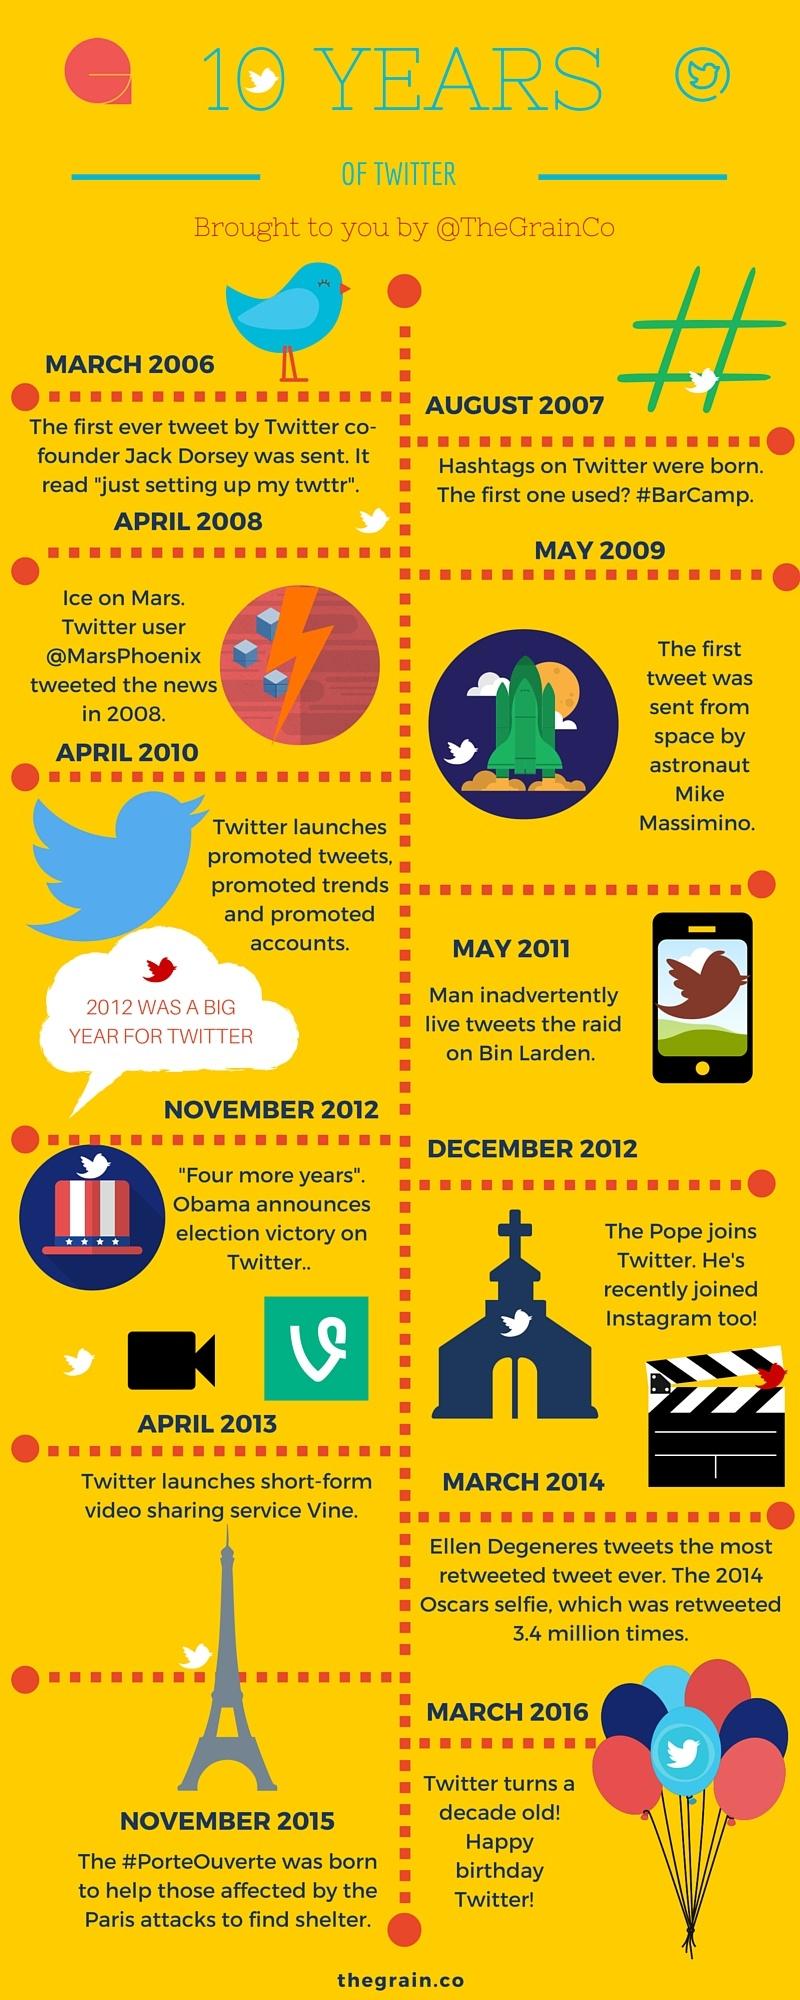 Twitter at Ten - Marketing Infographic